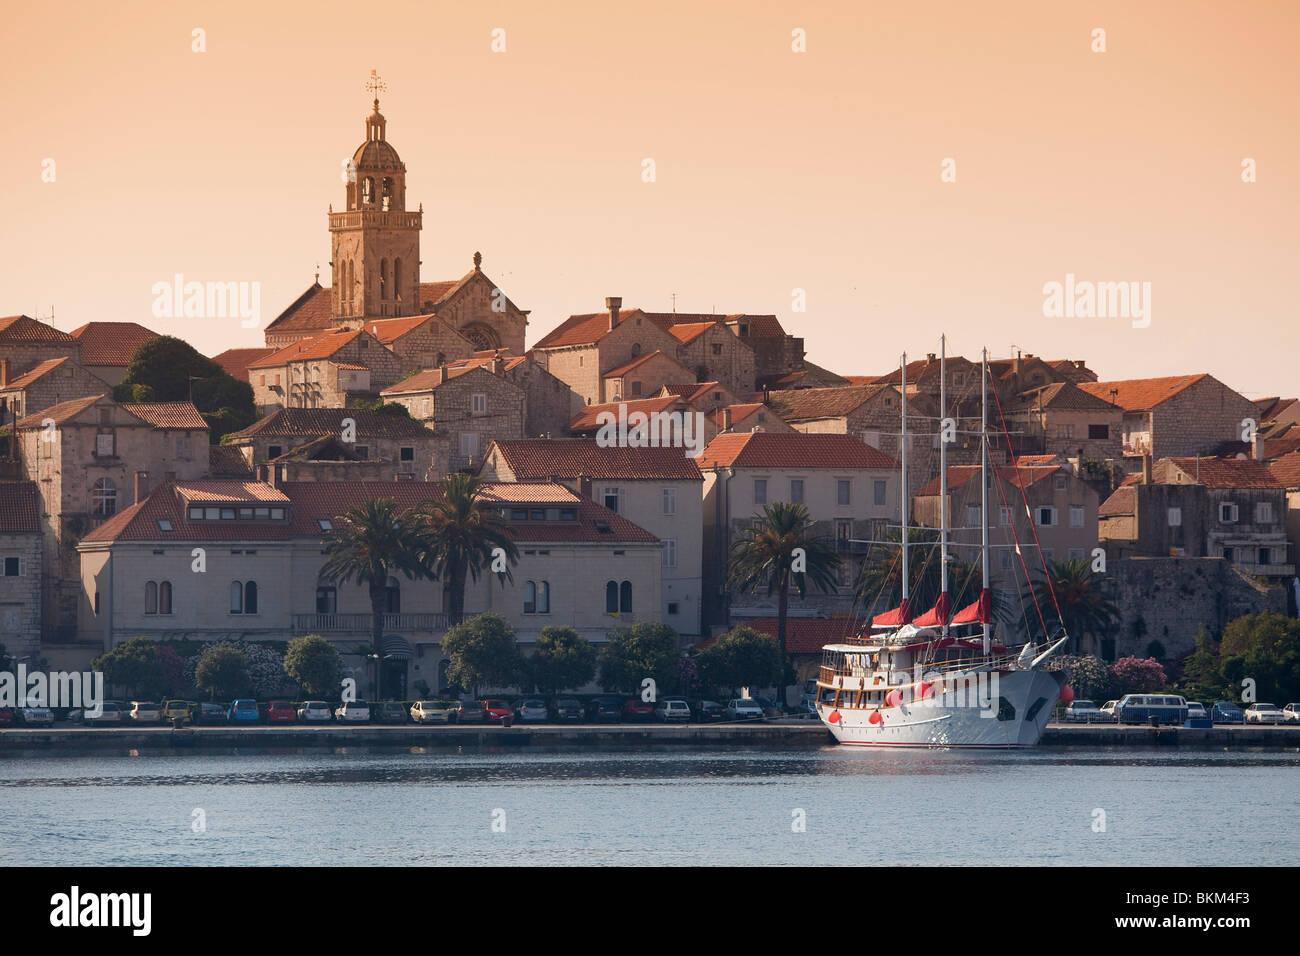 Croatia, Dalmatia, Dalmatian Coast, Korcula Island, Korcula City - Stock Image